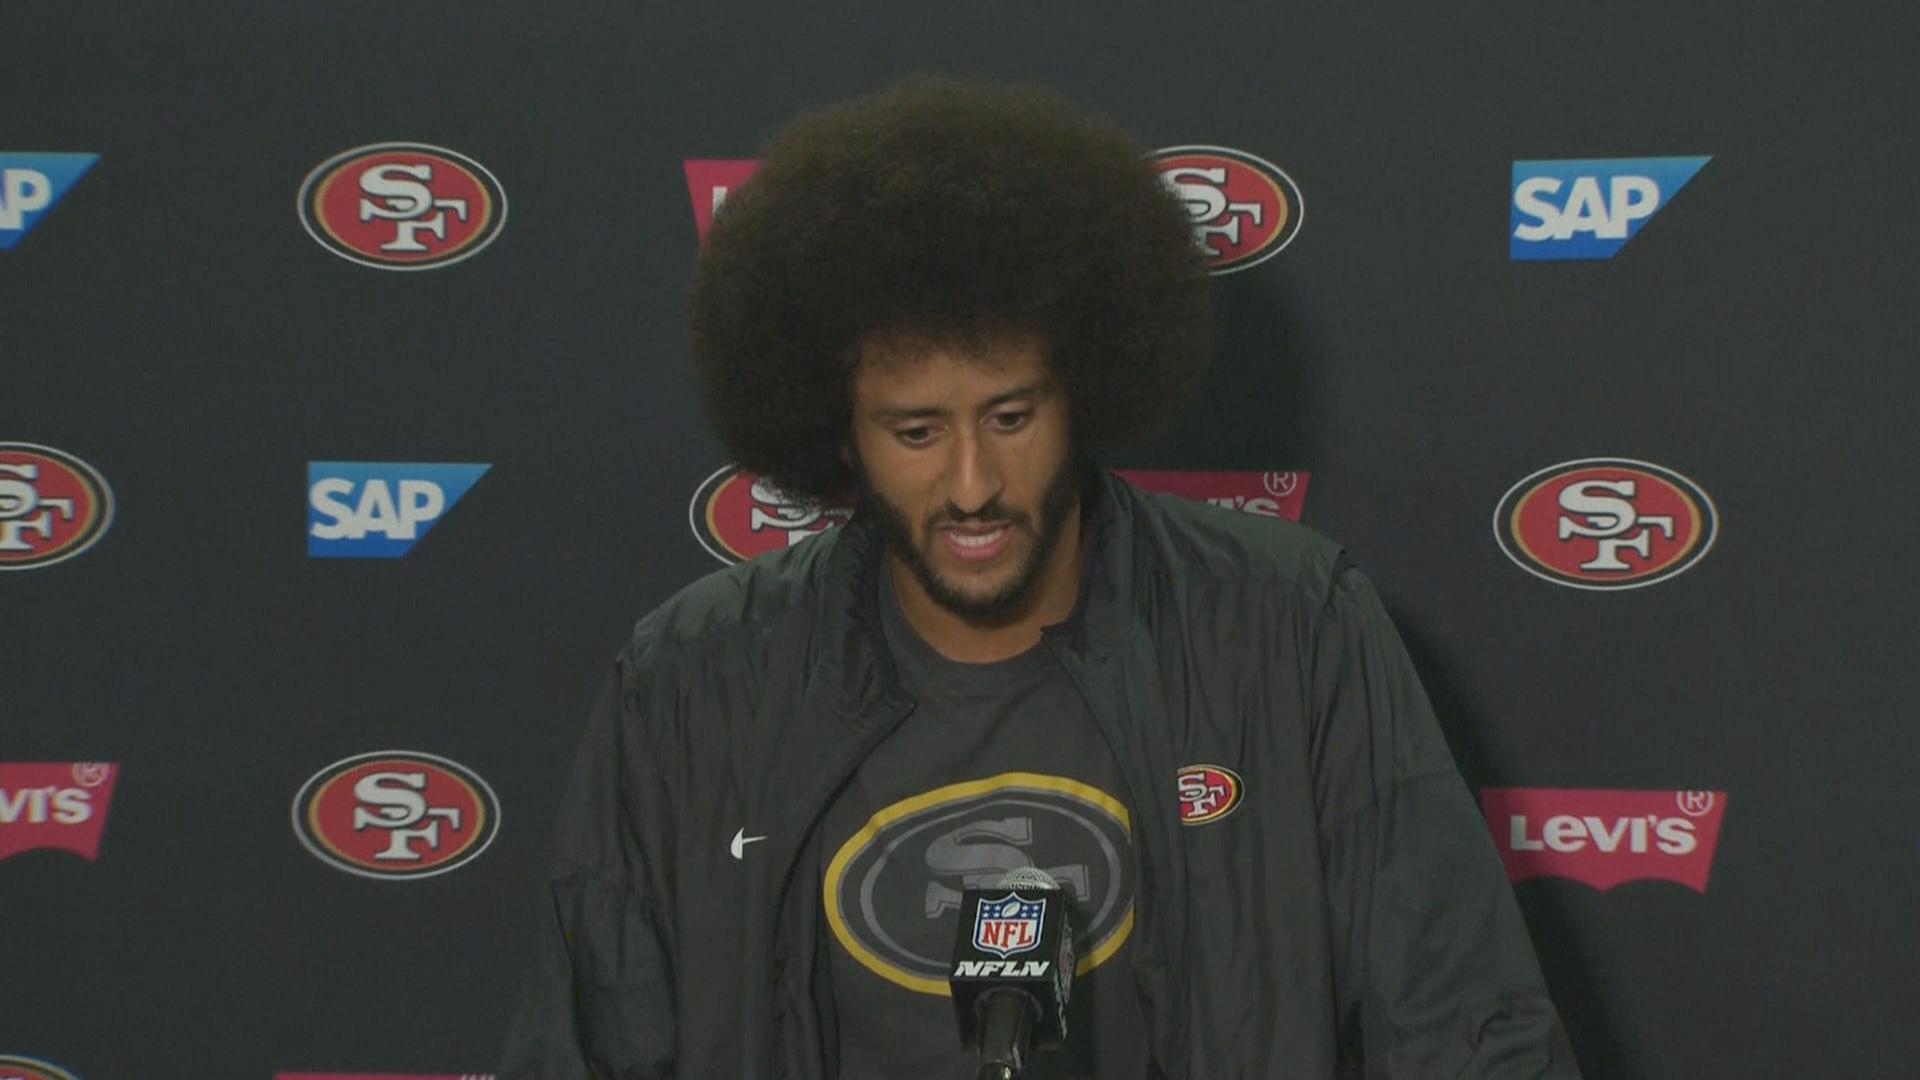 San Francisco 49ers quarterback Colin Kaepernick said he'd donate $1 million to community organizations. Sept. 1, 2016.